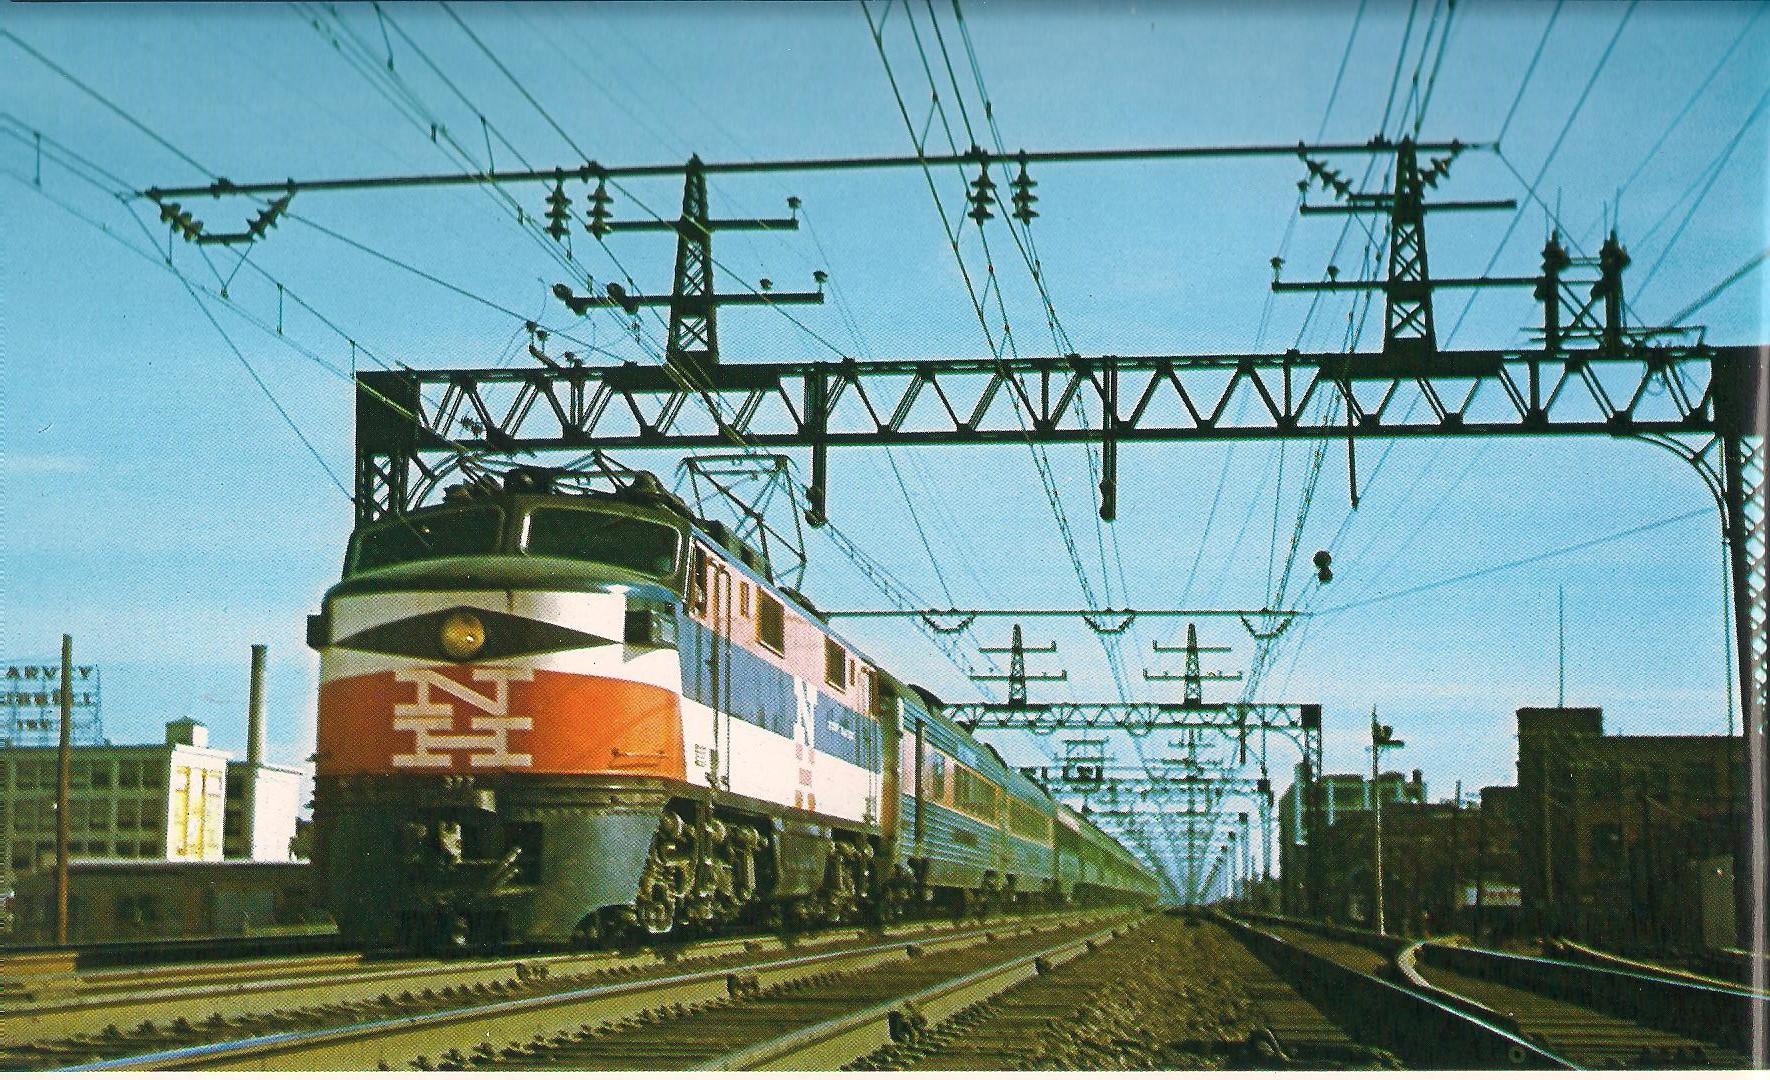 Jet in Bport ramp trk 001.jpg